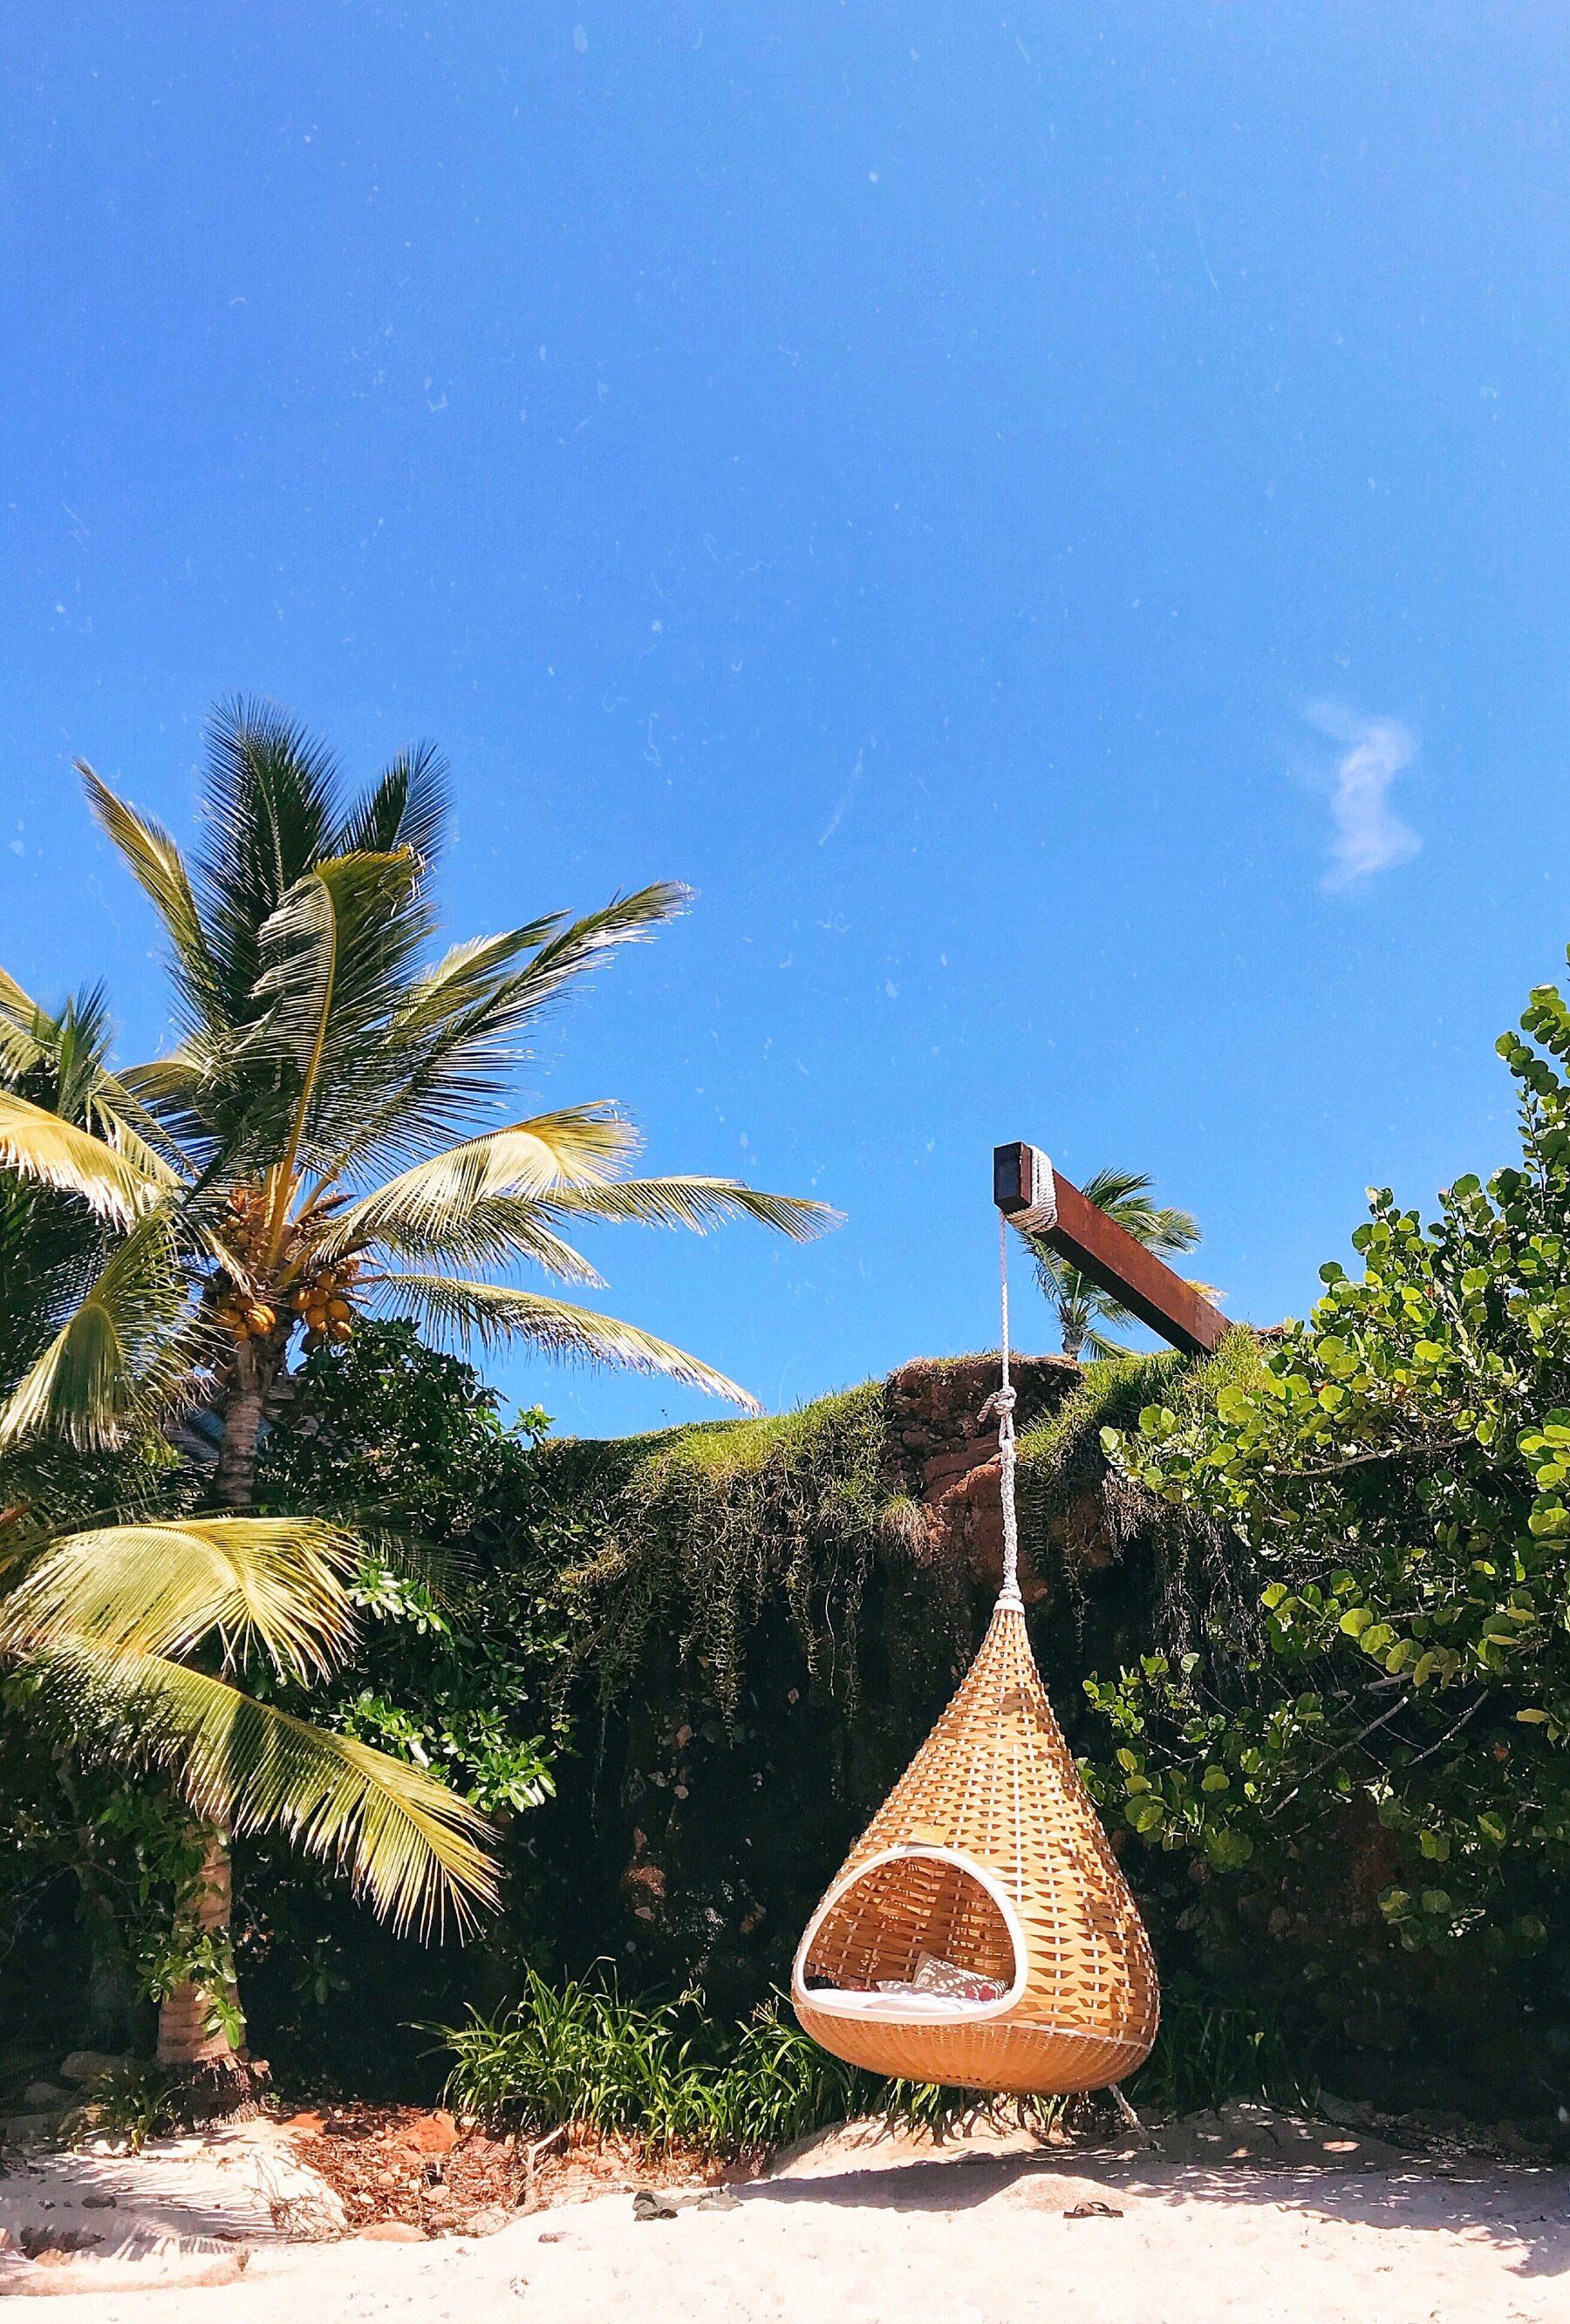 Punta Mita, Mexico travel guide